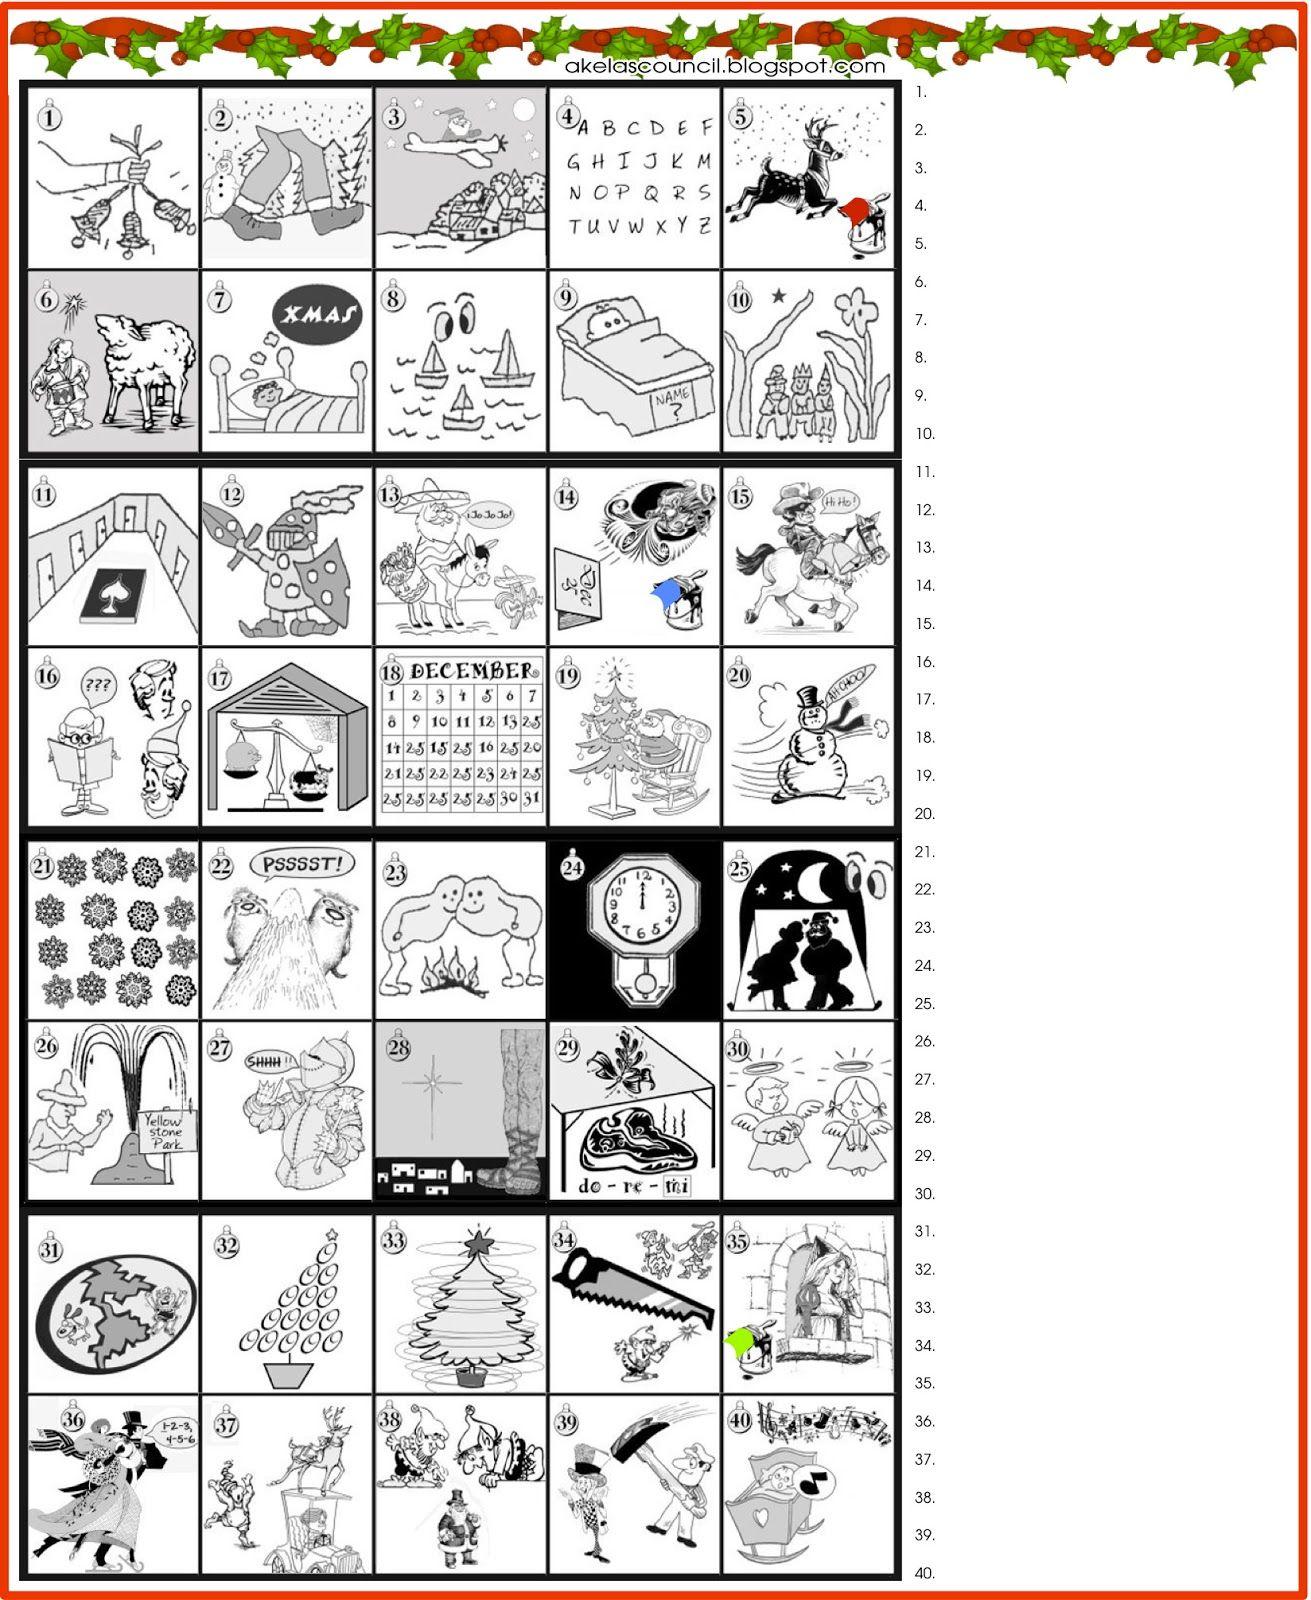 Printable * Guess The Christmas Songs Or Carols Word Puzzle - Free Printable Christmas Puzzles And Games